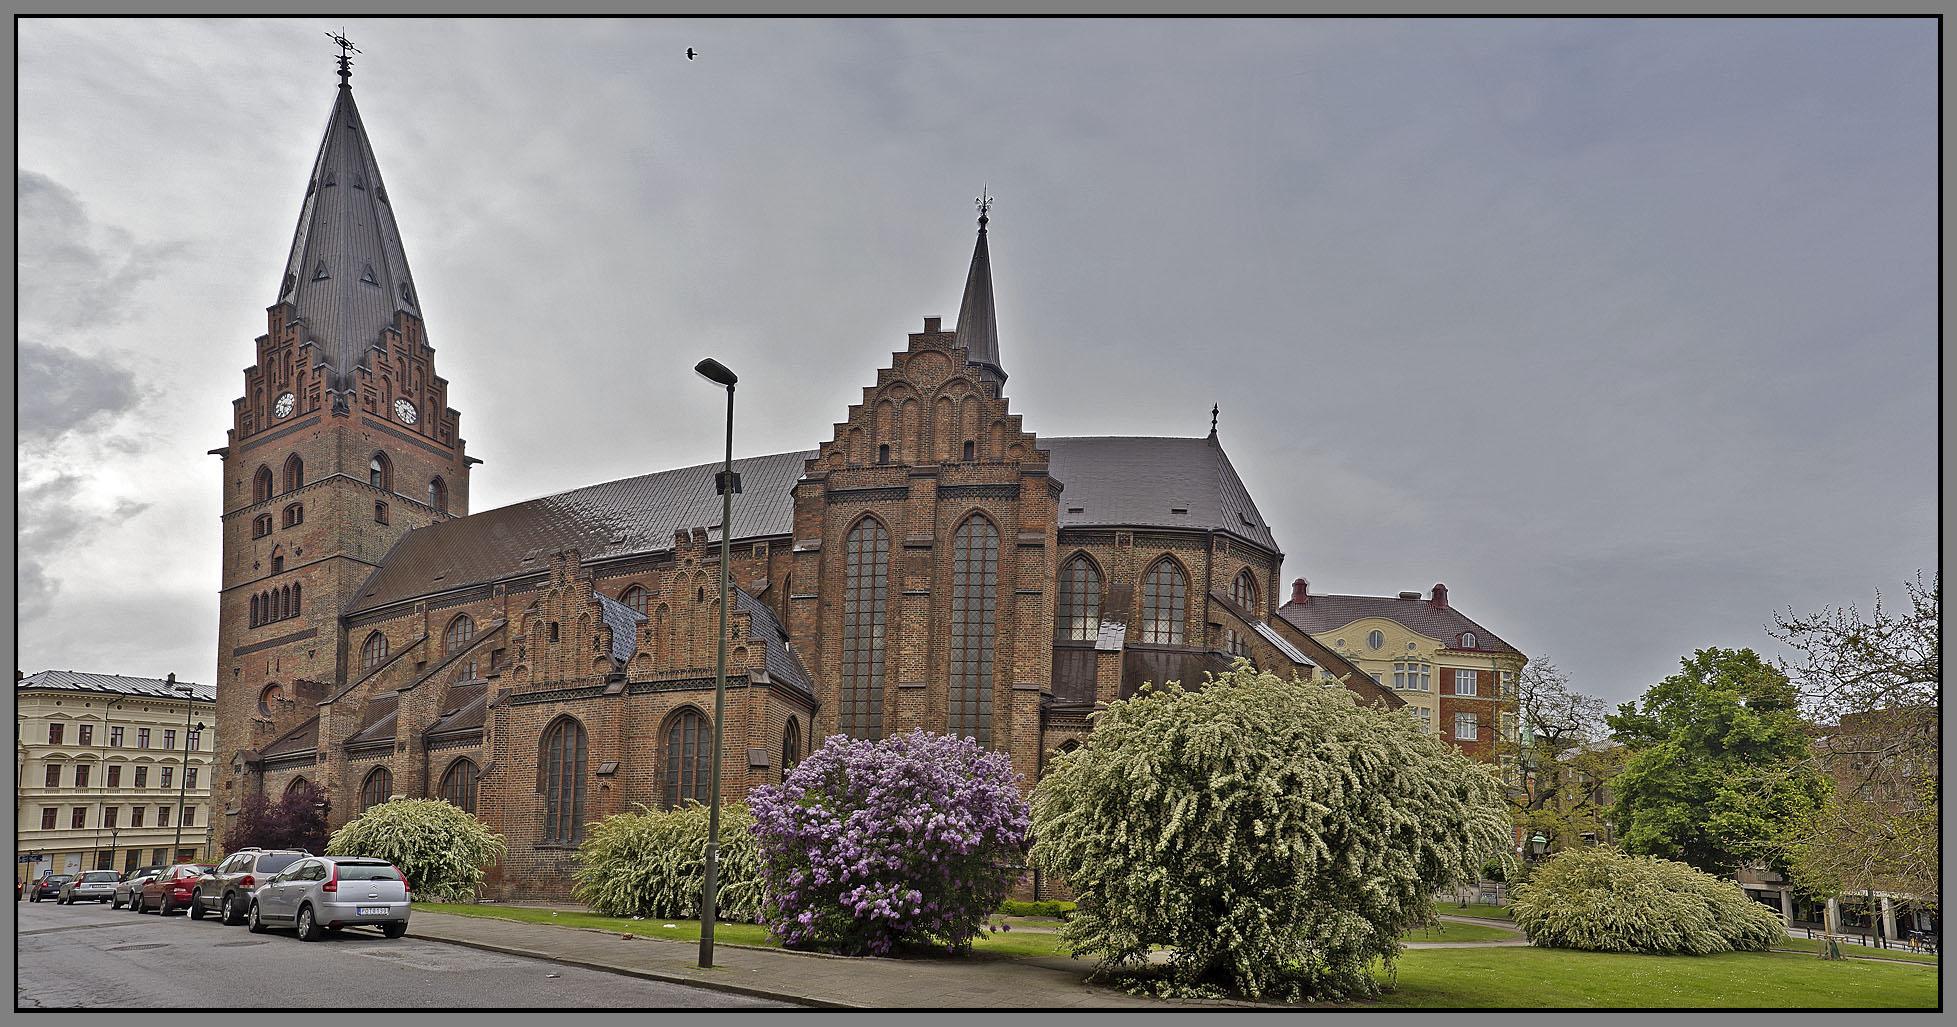 Sweden, Malmo - Sankt Petri kyrka